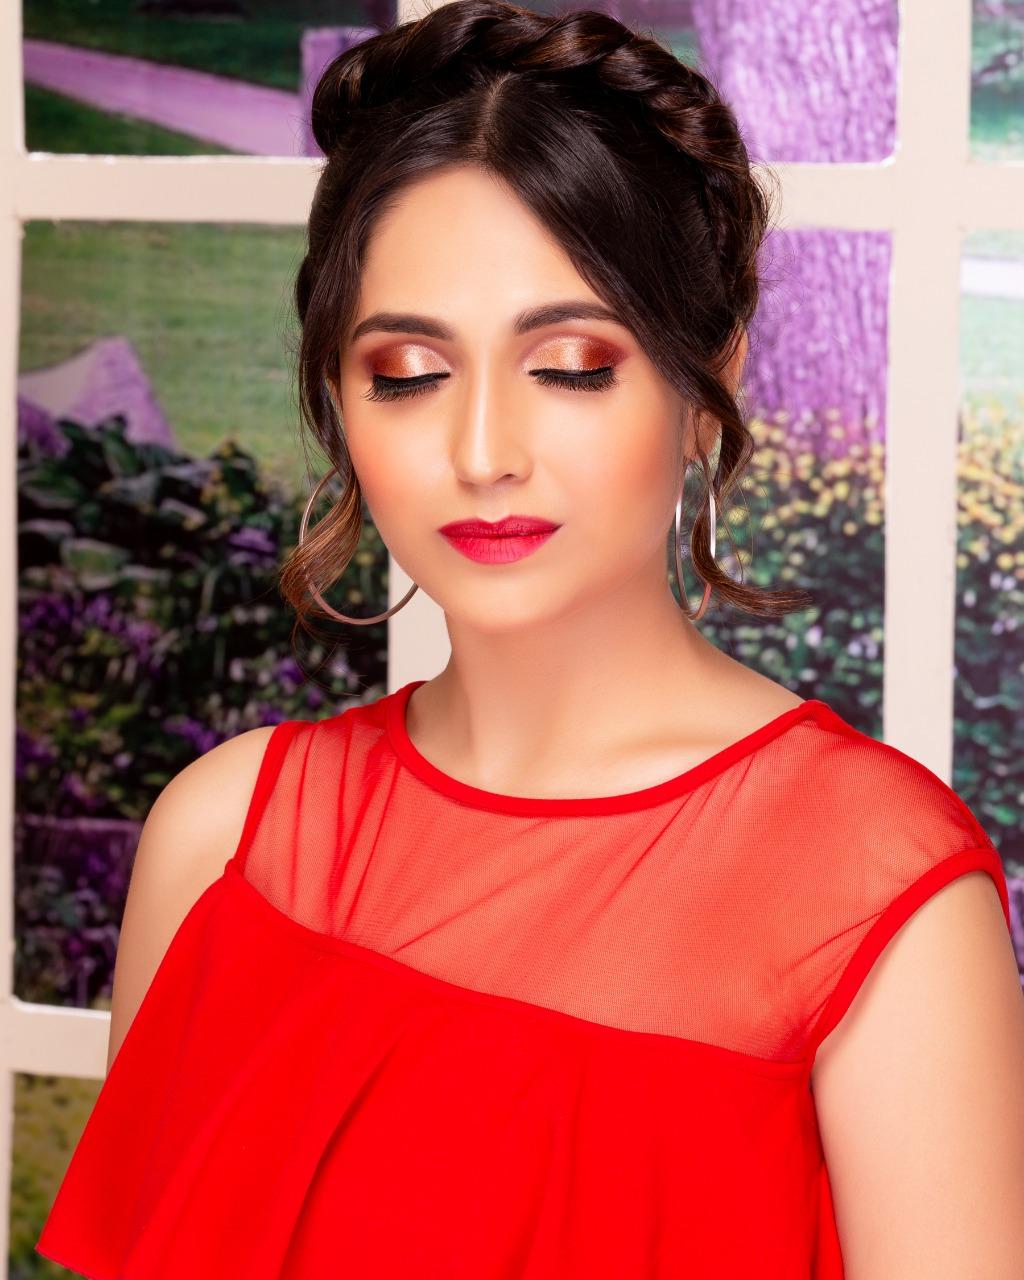 sucharita-das-makeup-artist-mumbai